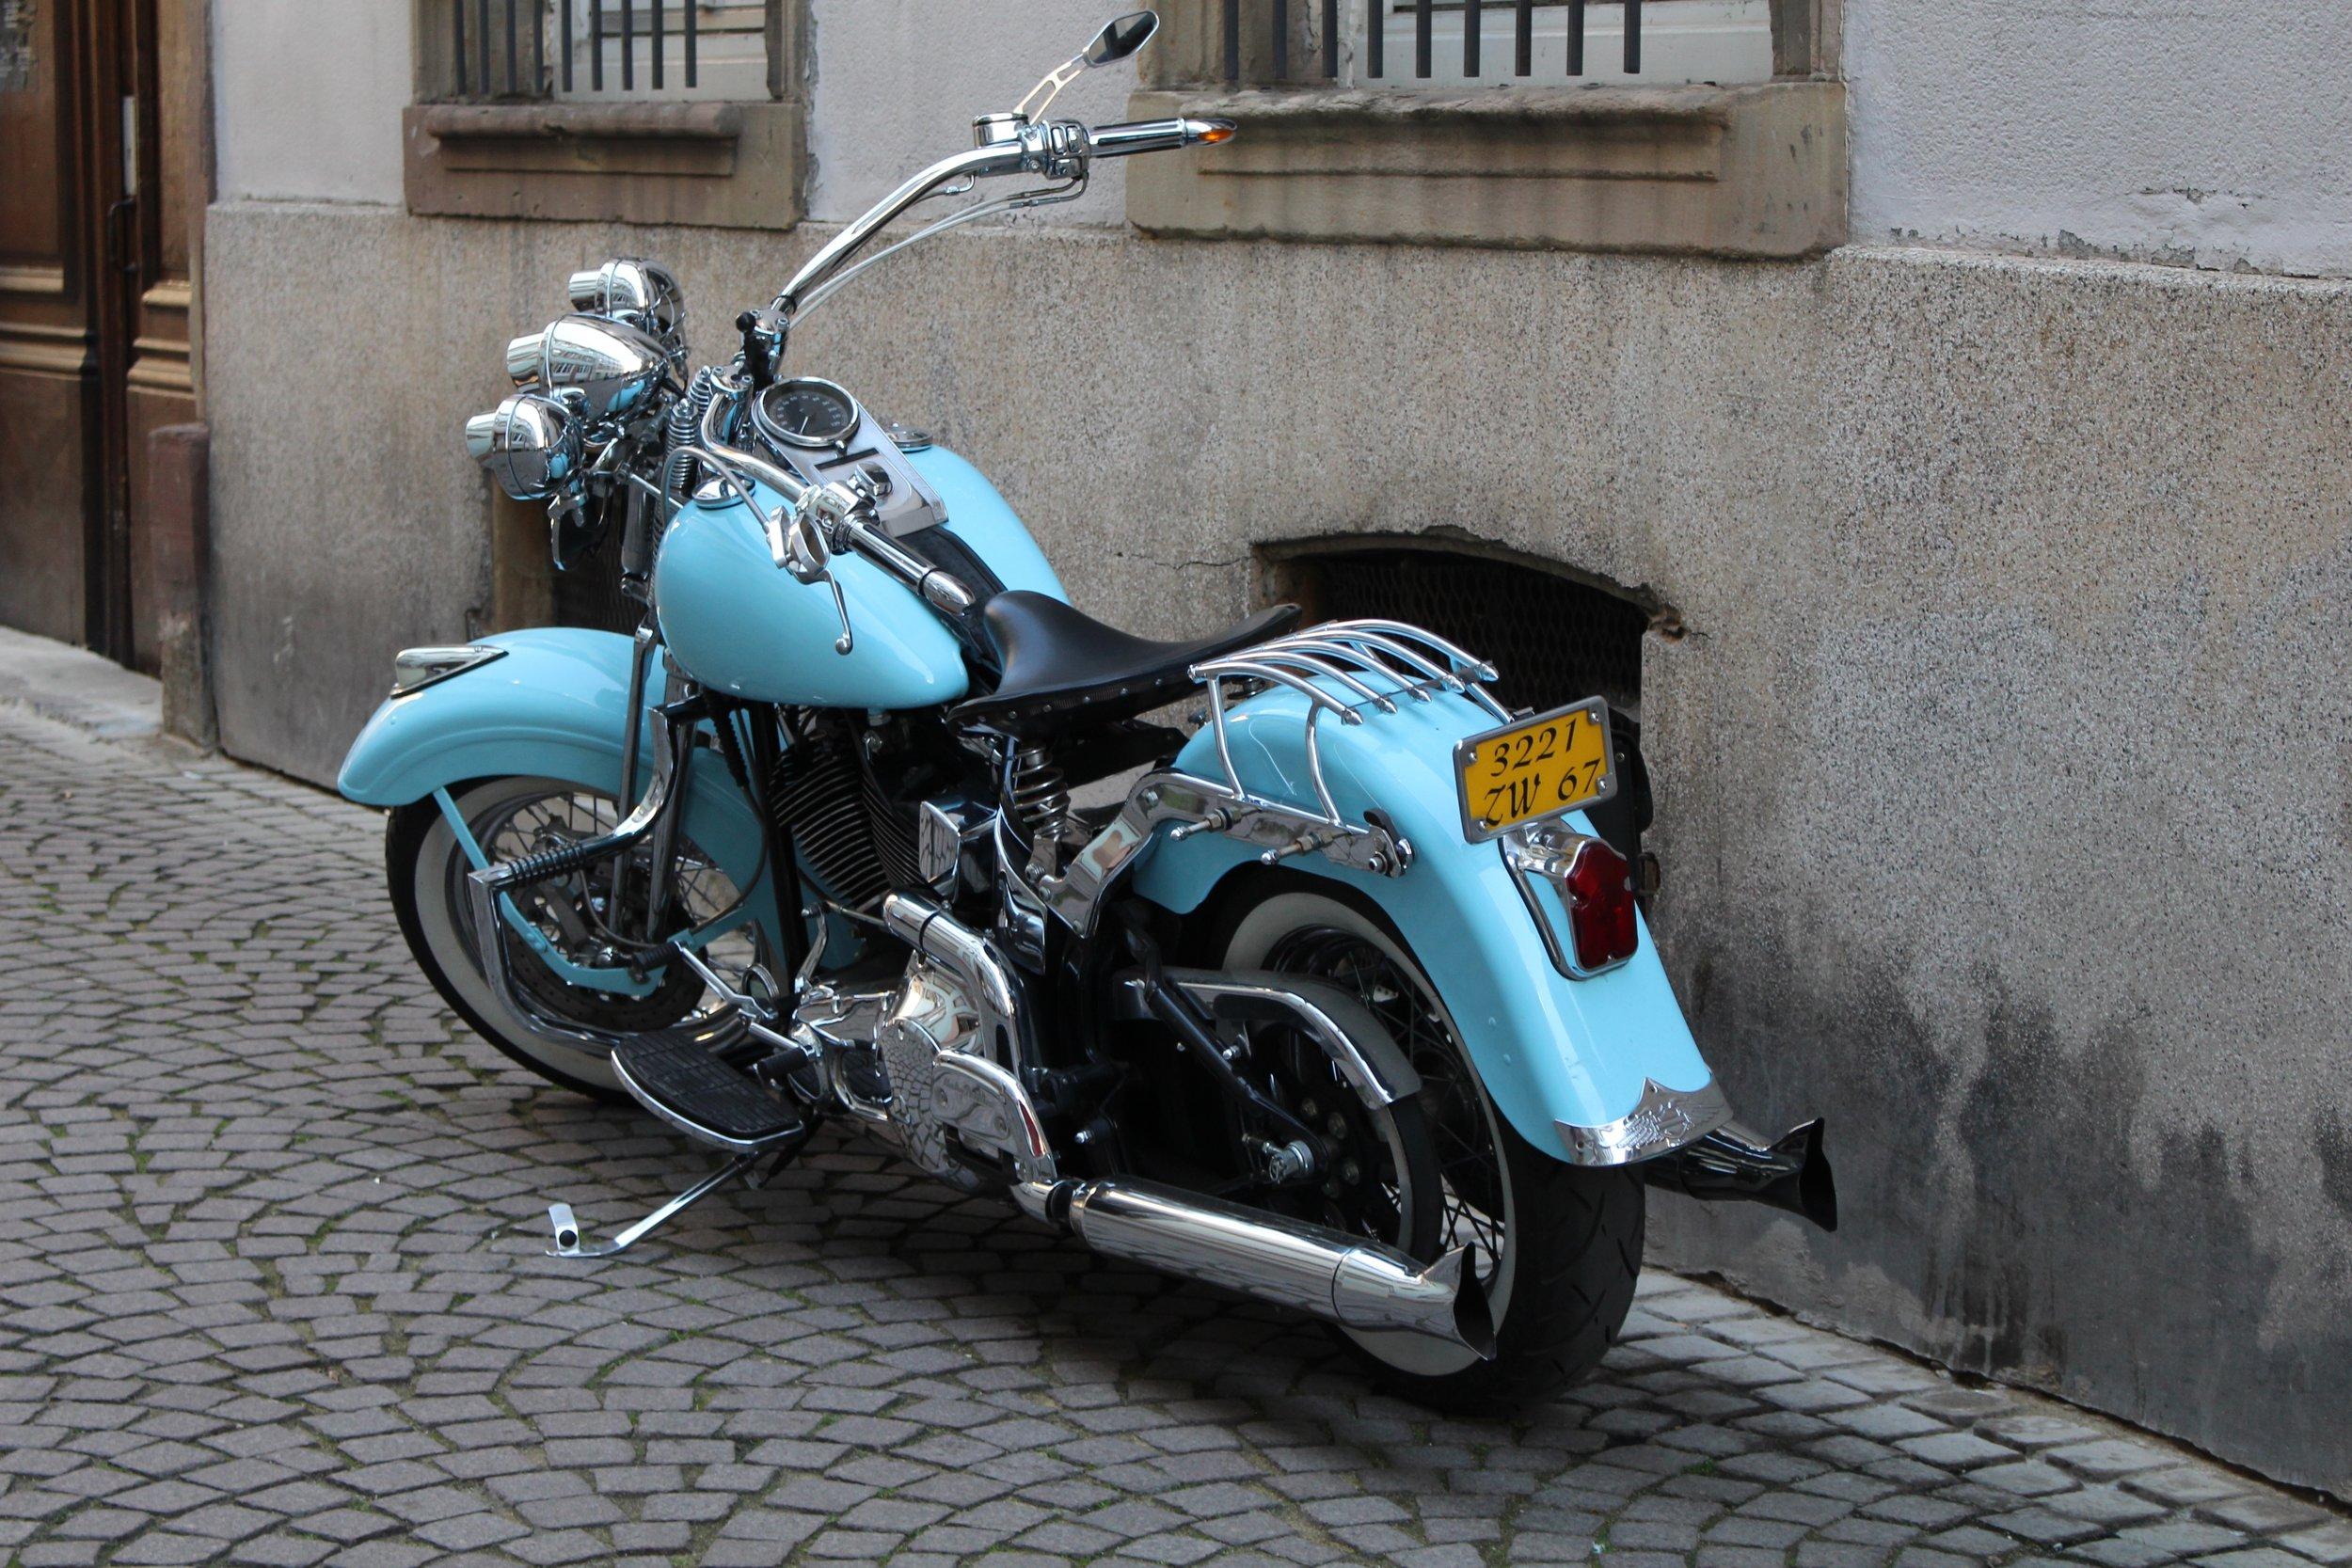 Motorcycle in Strasbourg, France